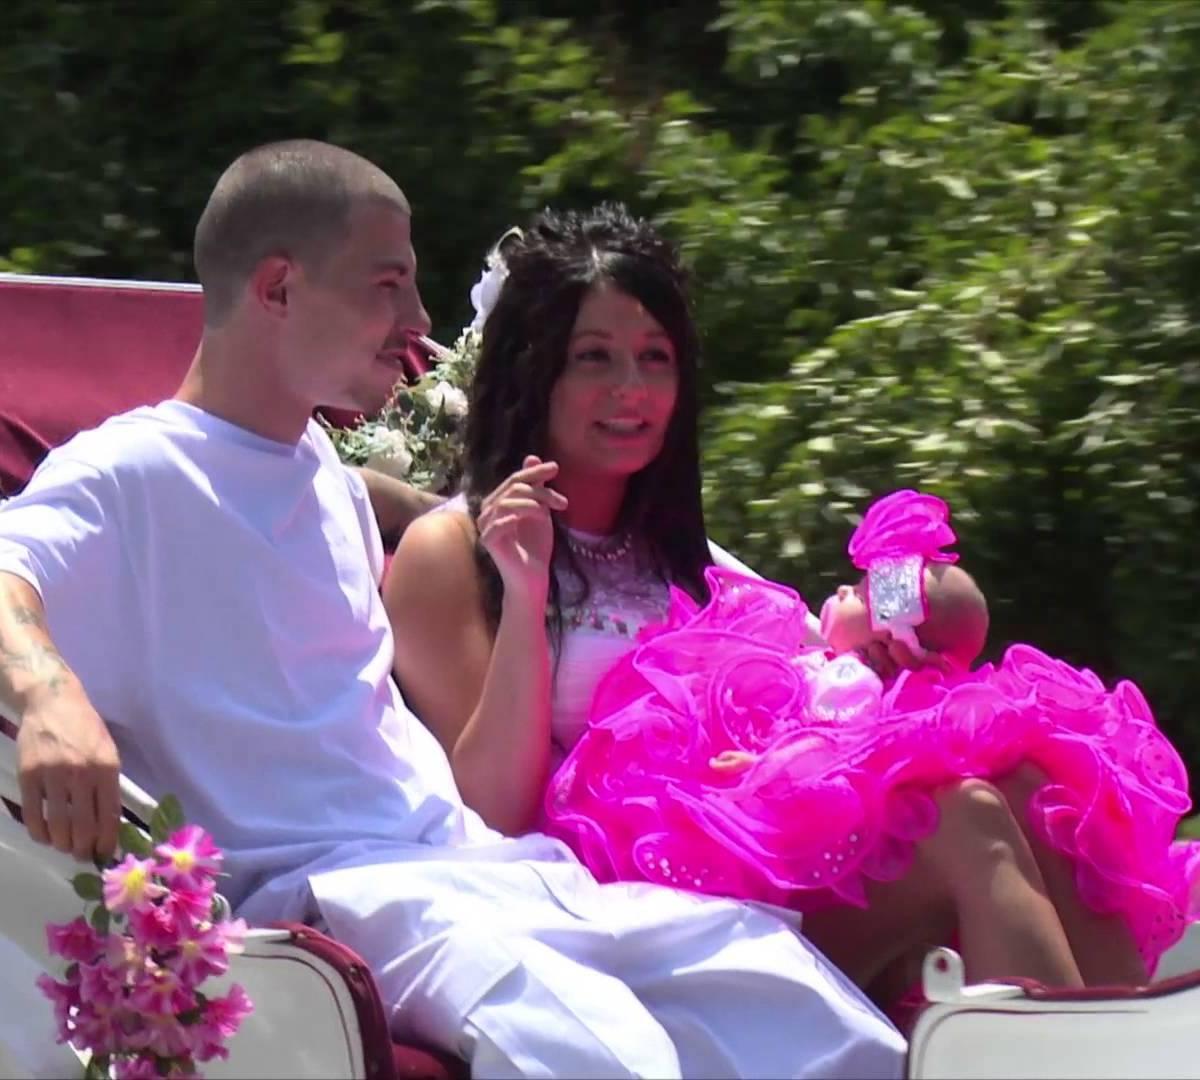 Is My Big Fat American Gypsy Wedding Fake? Uh, Yeah It All Is